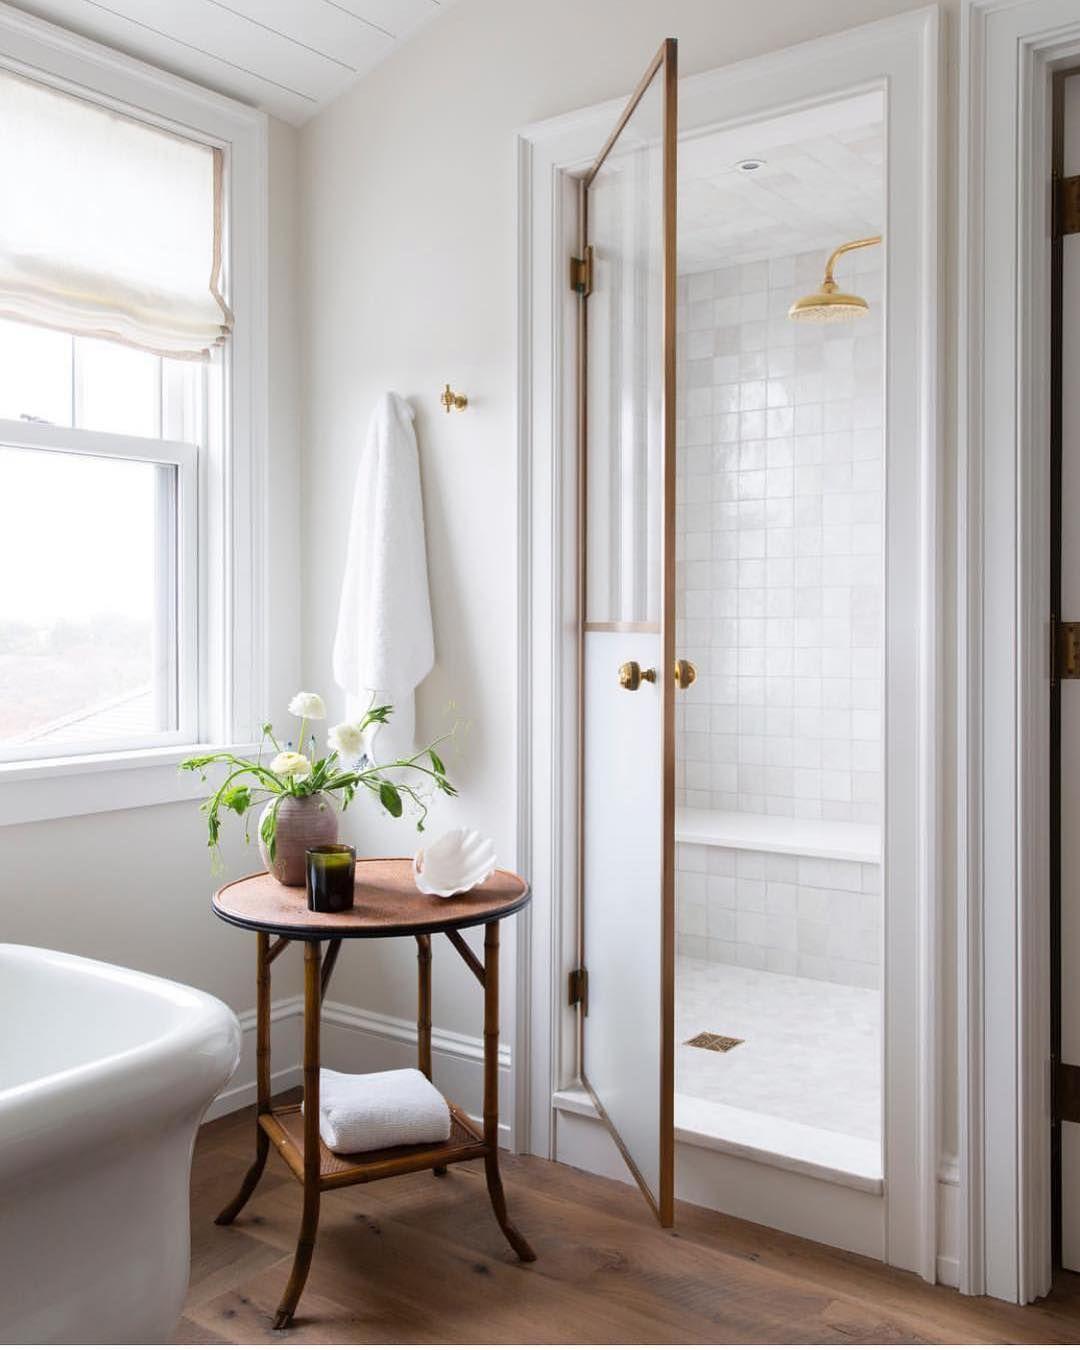 Pin By Stephanie Gleeson On Toiletd: Pin By Stephanie Foor On Bath